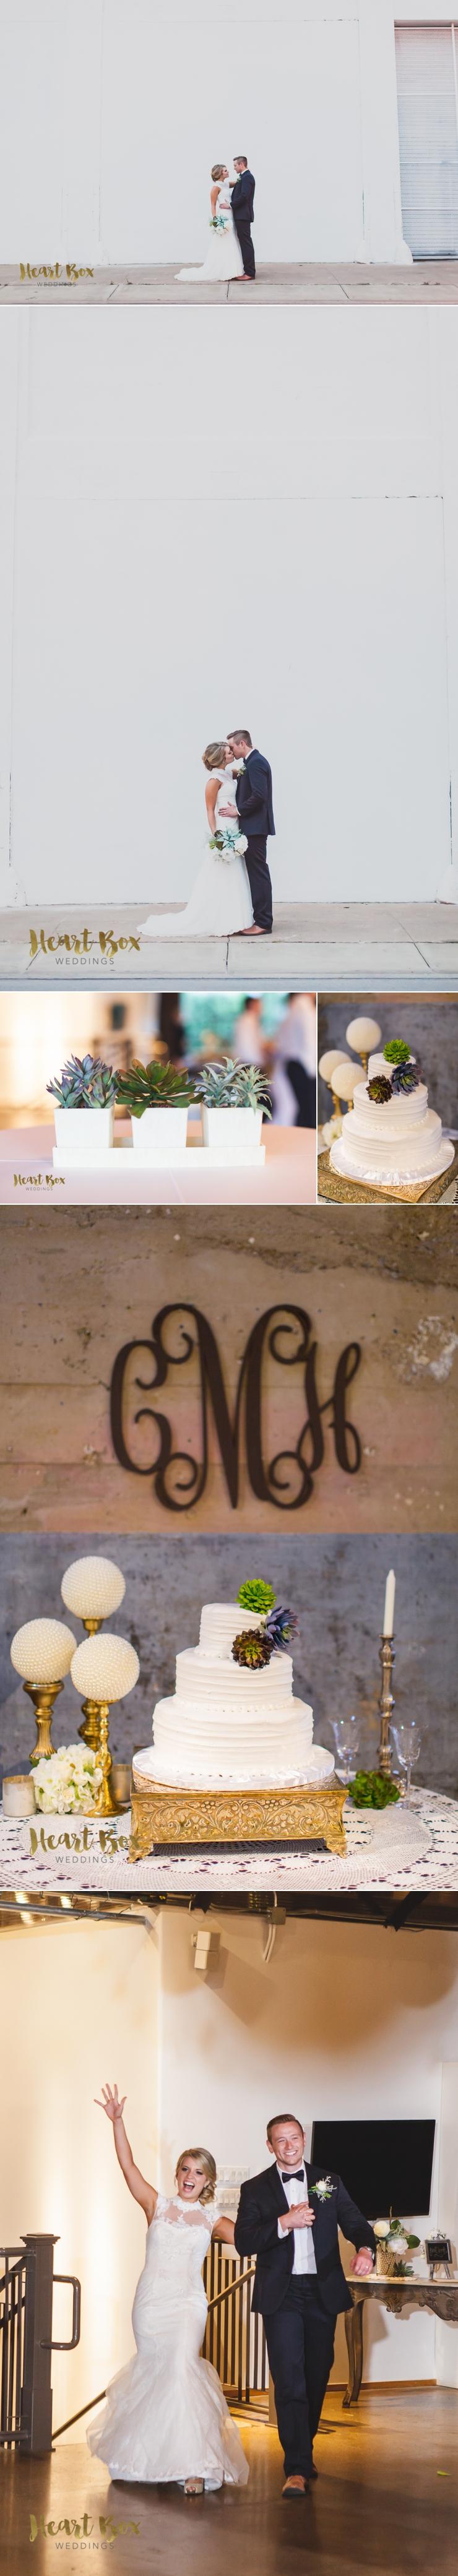 Mabry Wedding 19.jpg